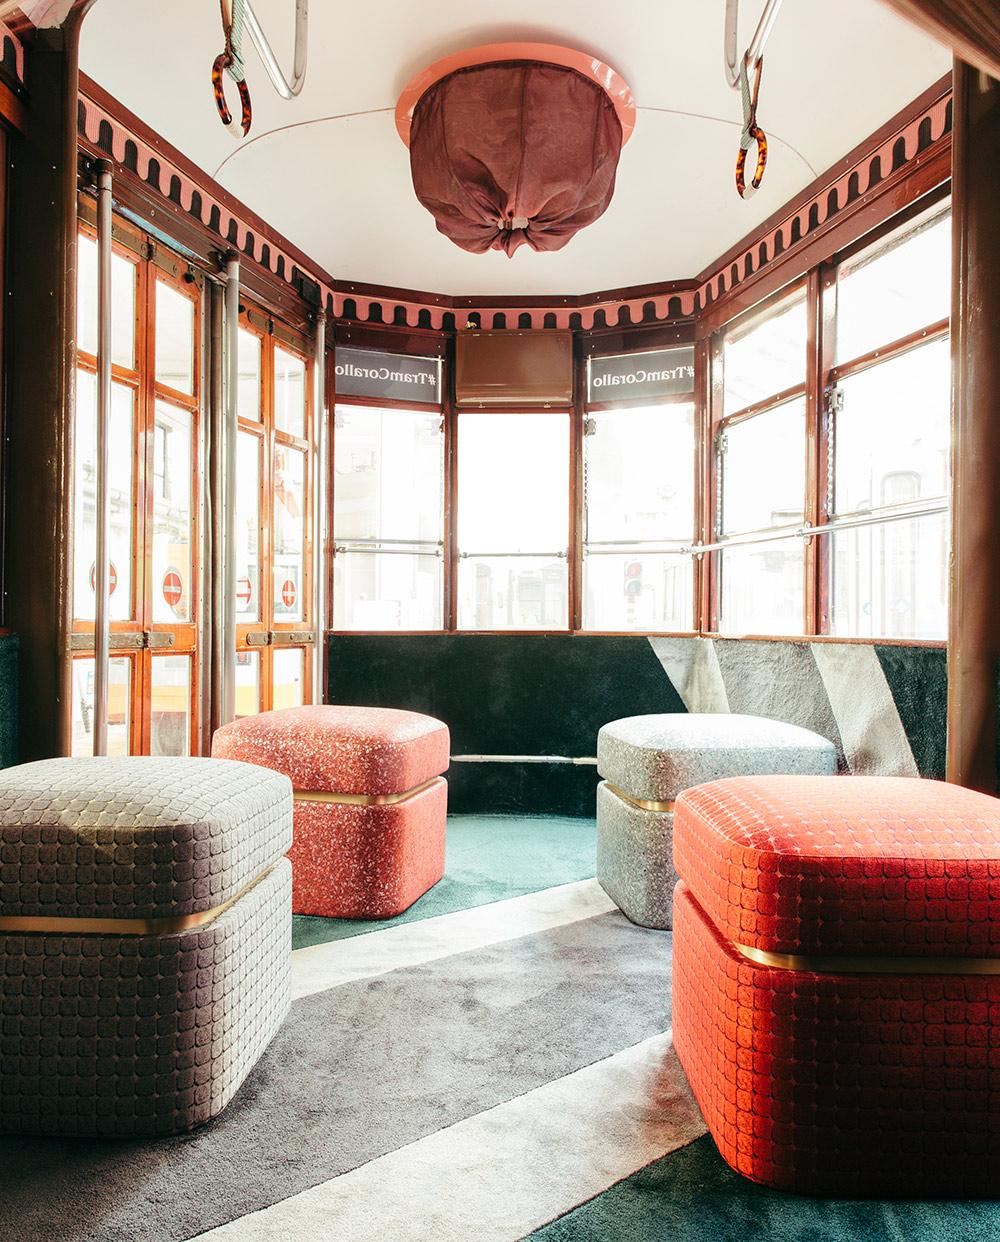 Eclectic Trends|Top 5 -Milan Design Week 2018-Tram Corallo- Cristina Celestino